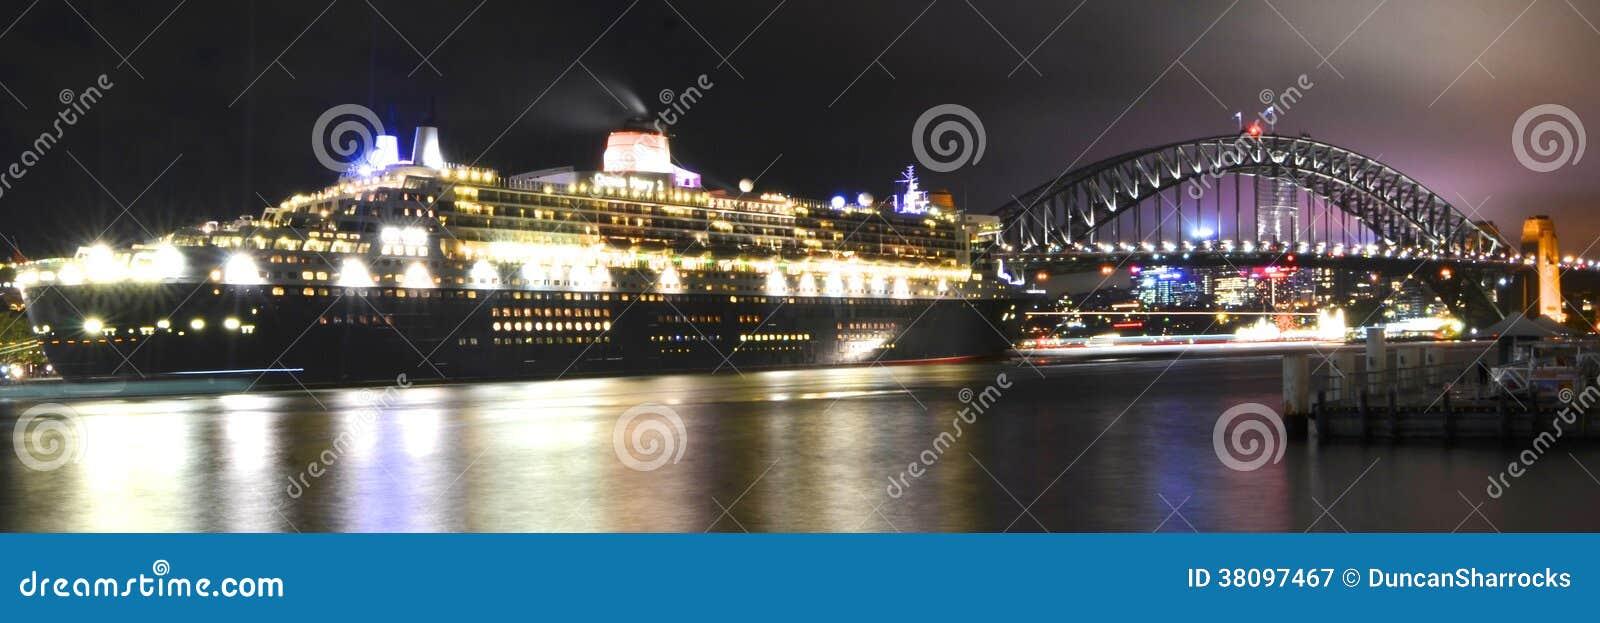 Queen Mary 2 en Sydney, Australia